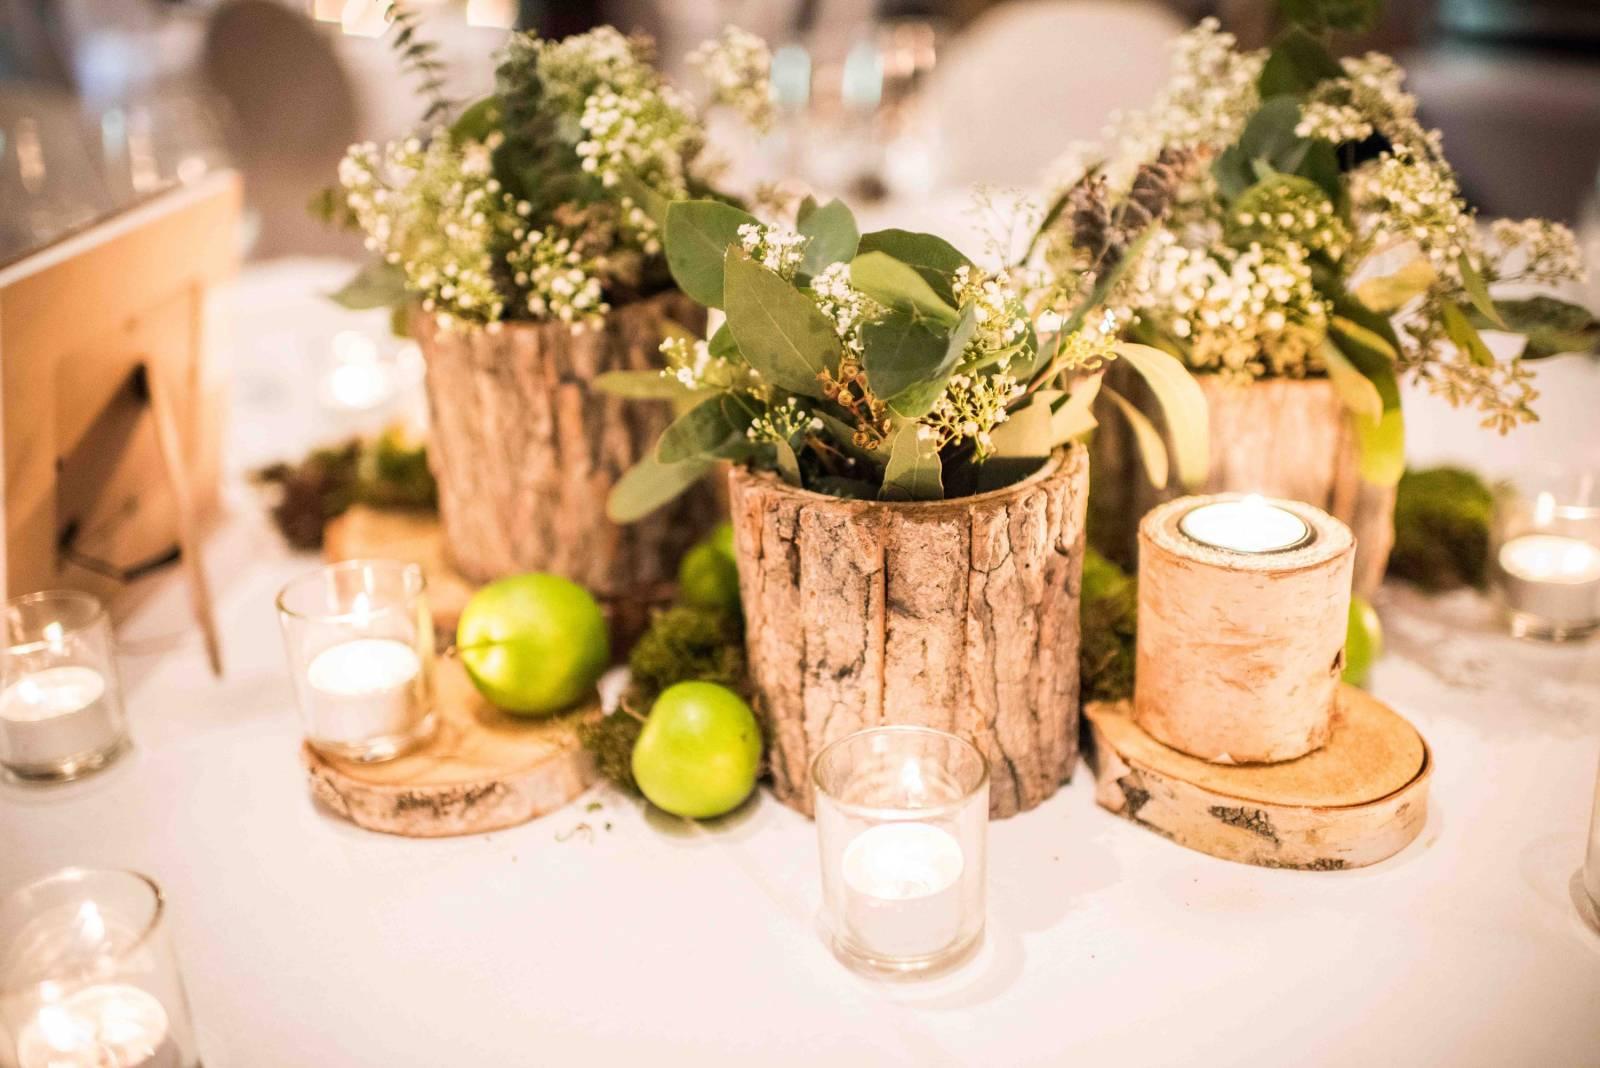 Carpe Diem Bloemen & Decoratie - House of Weddings  - 23